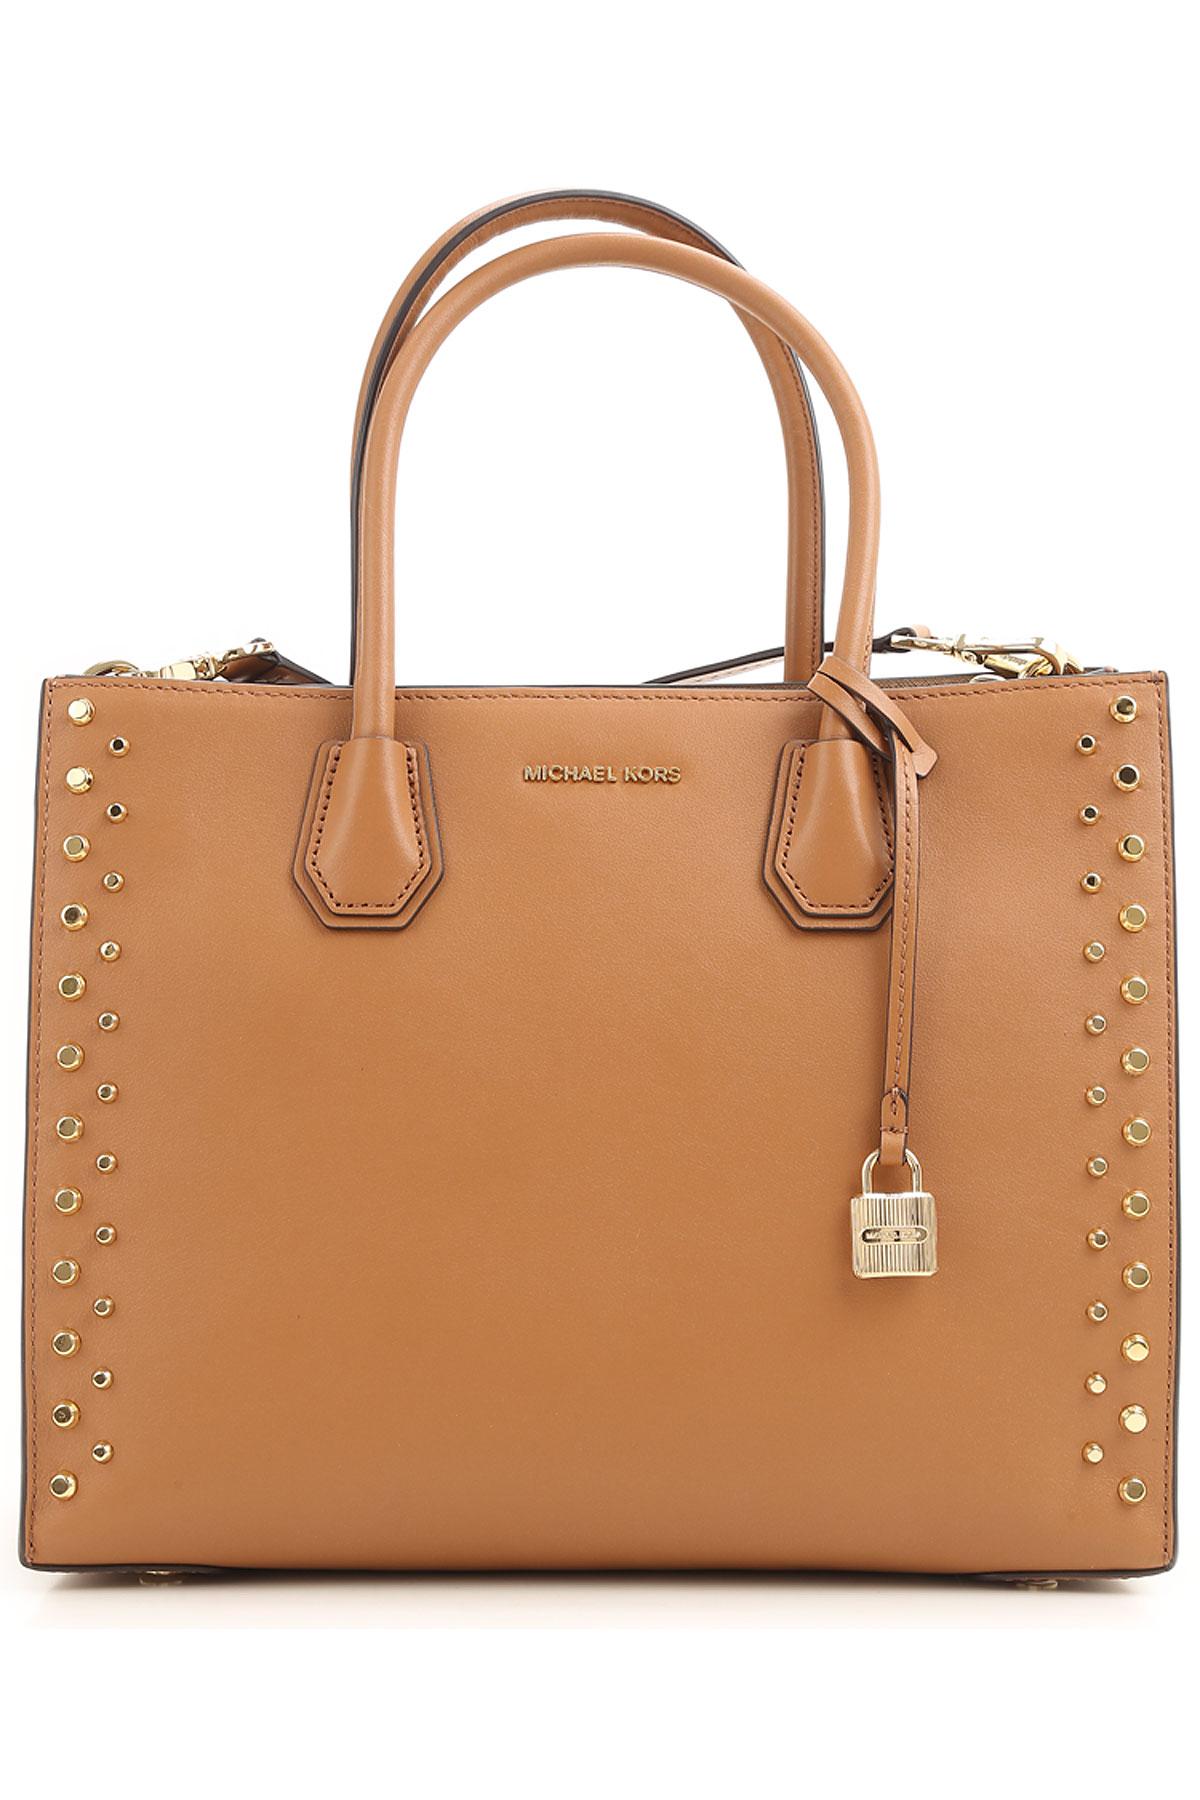 Michael Kors Top Handle Handbag, Acorn, Leather, 2017